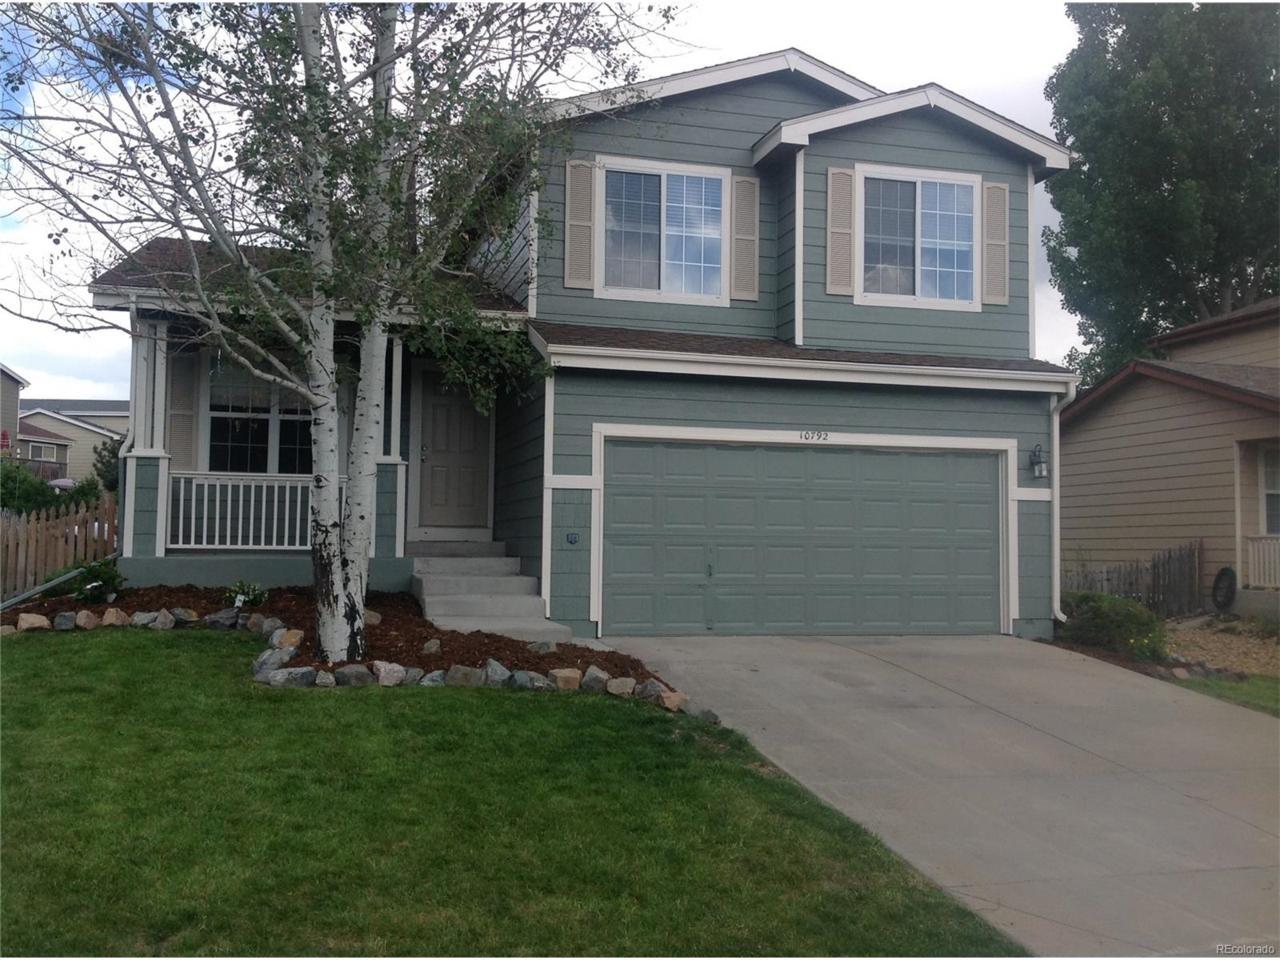 10792 Wheatfield Lane, Parker, CO 80138 (MLS #5076494) :: 8z Real Estate